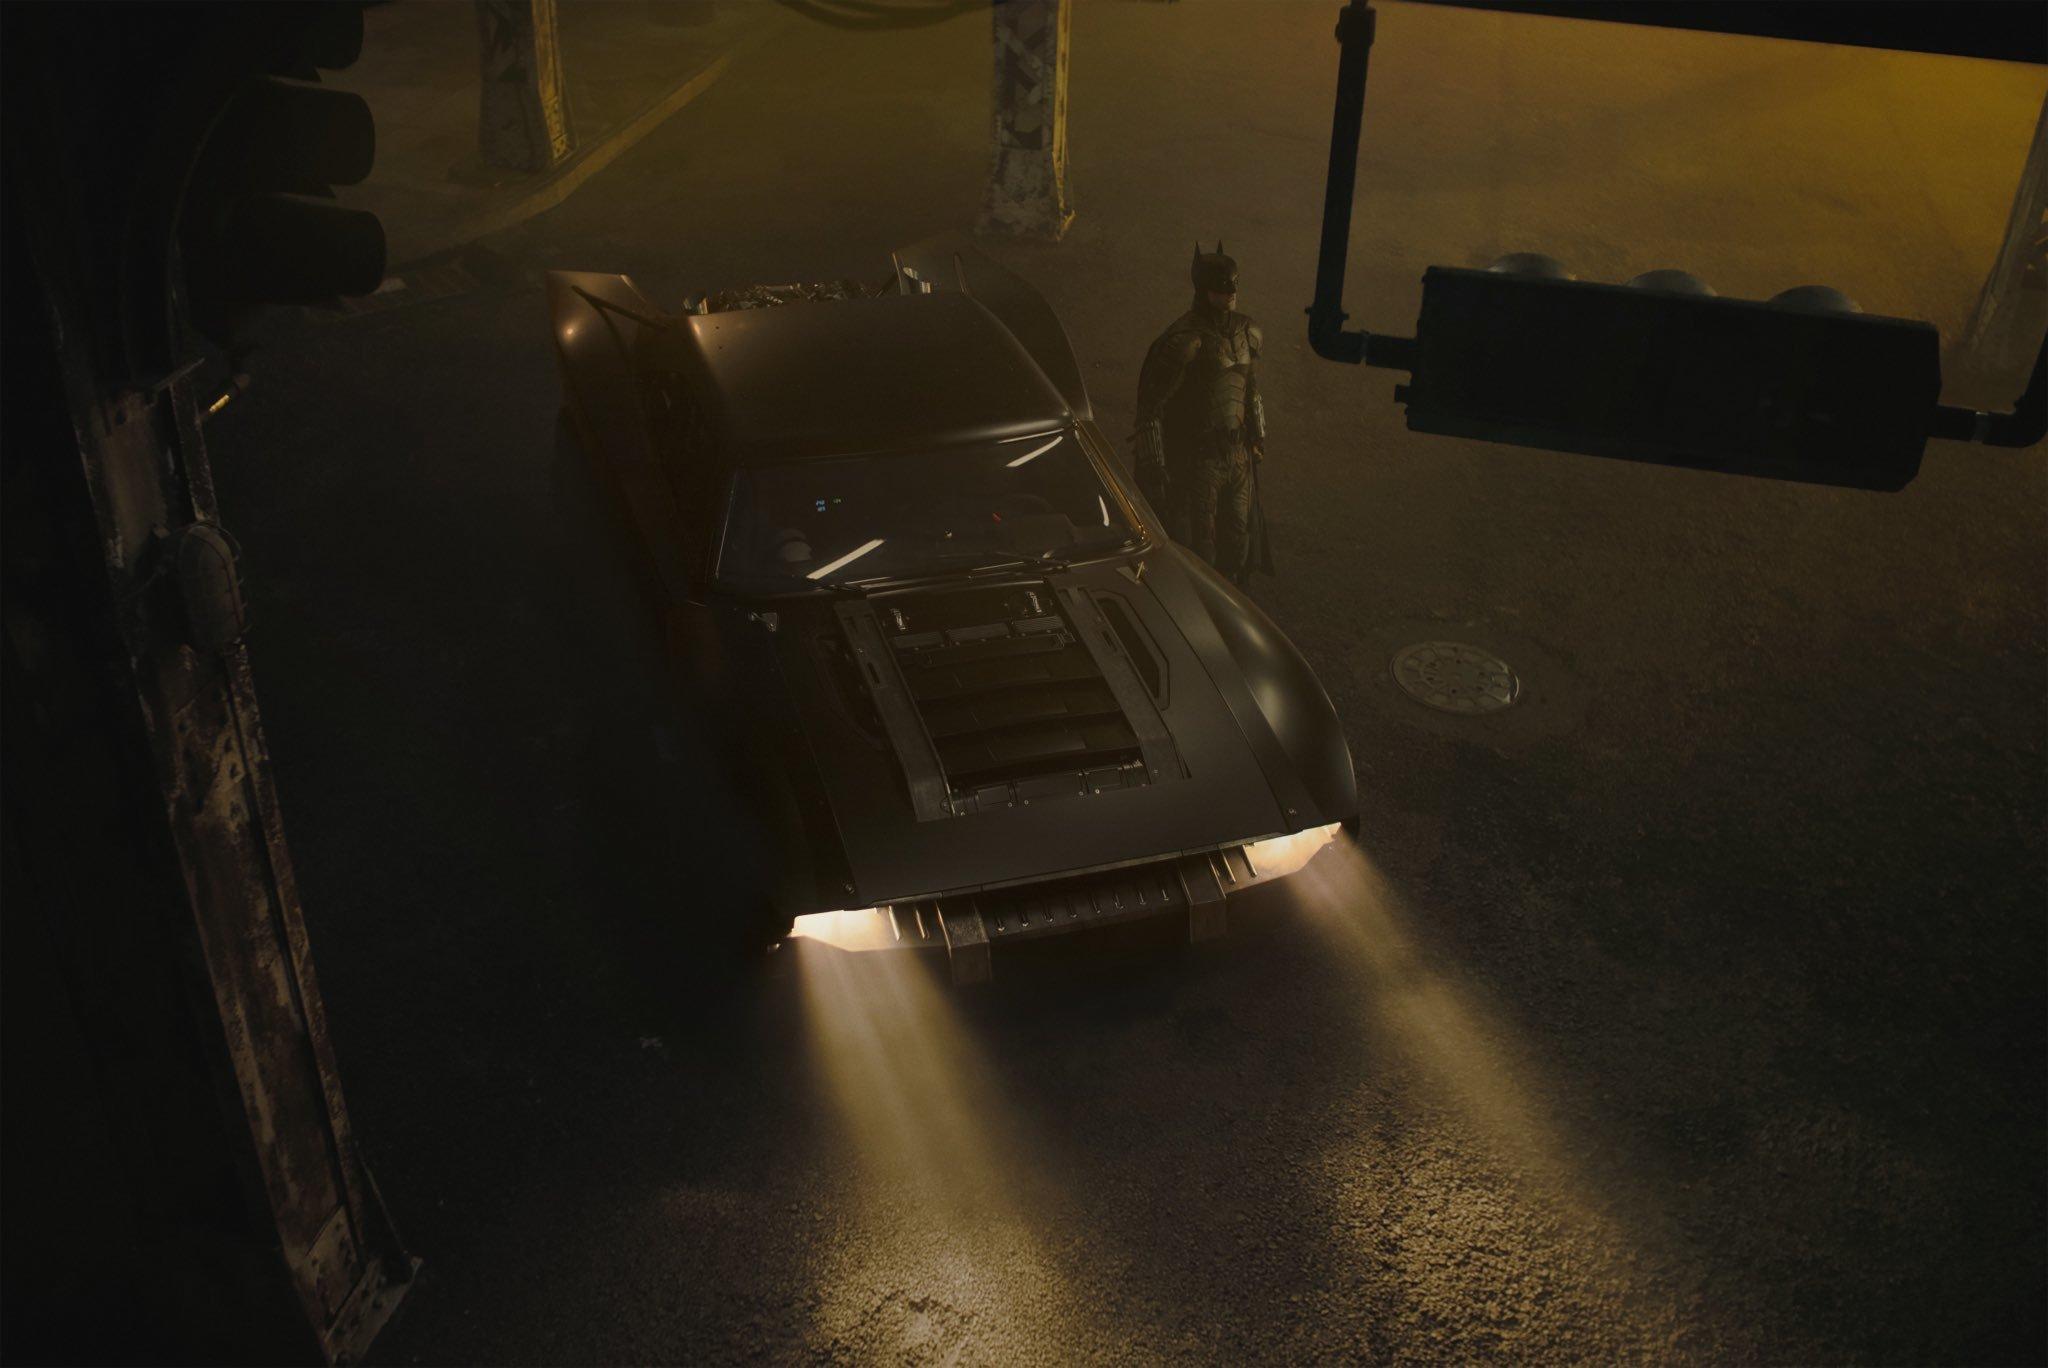 'The Batman' director Matt Reeves shares photos of Batmobile